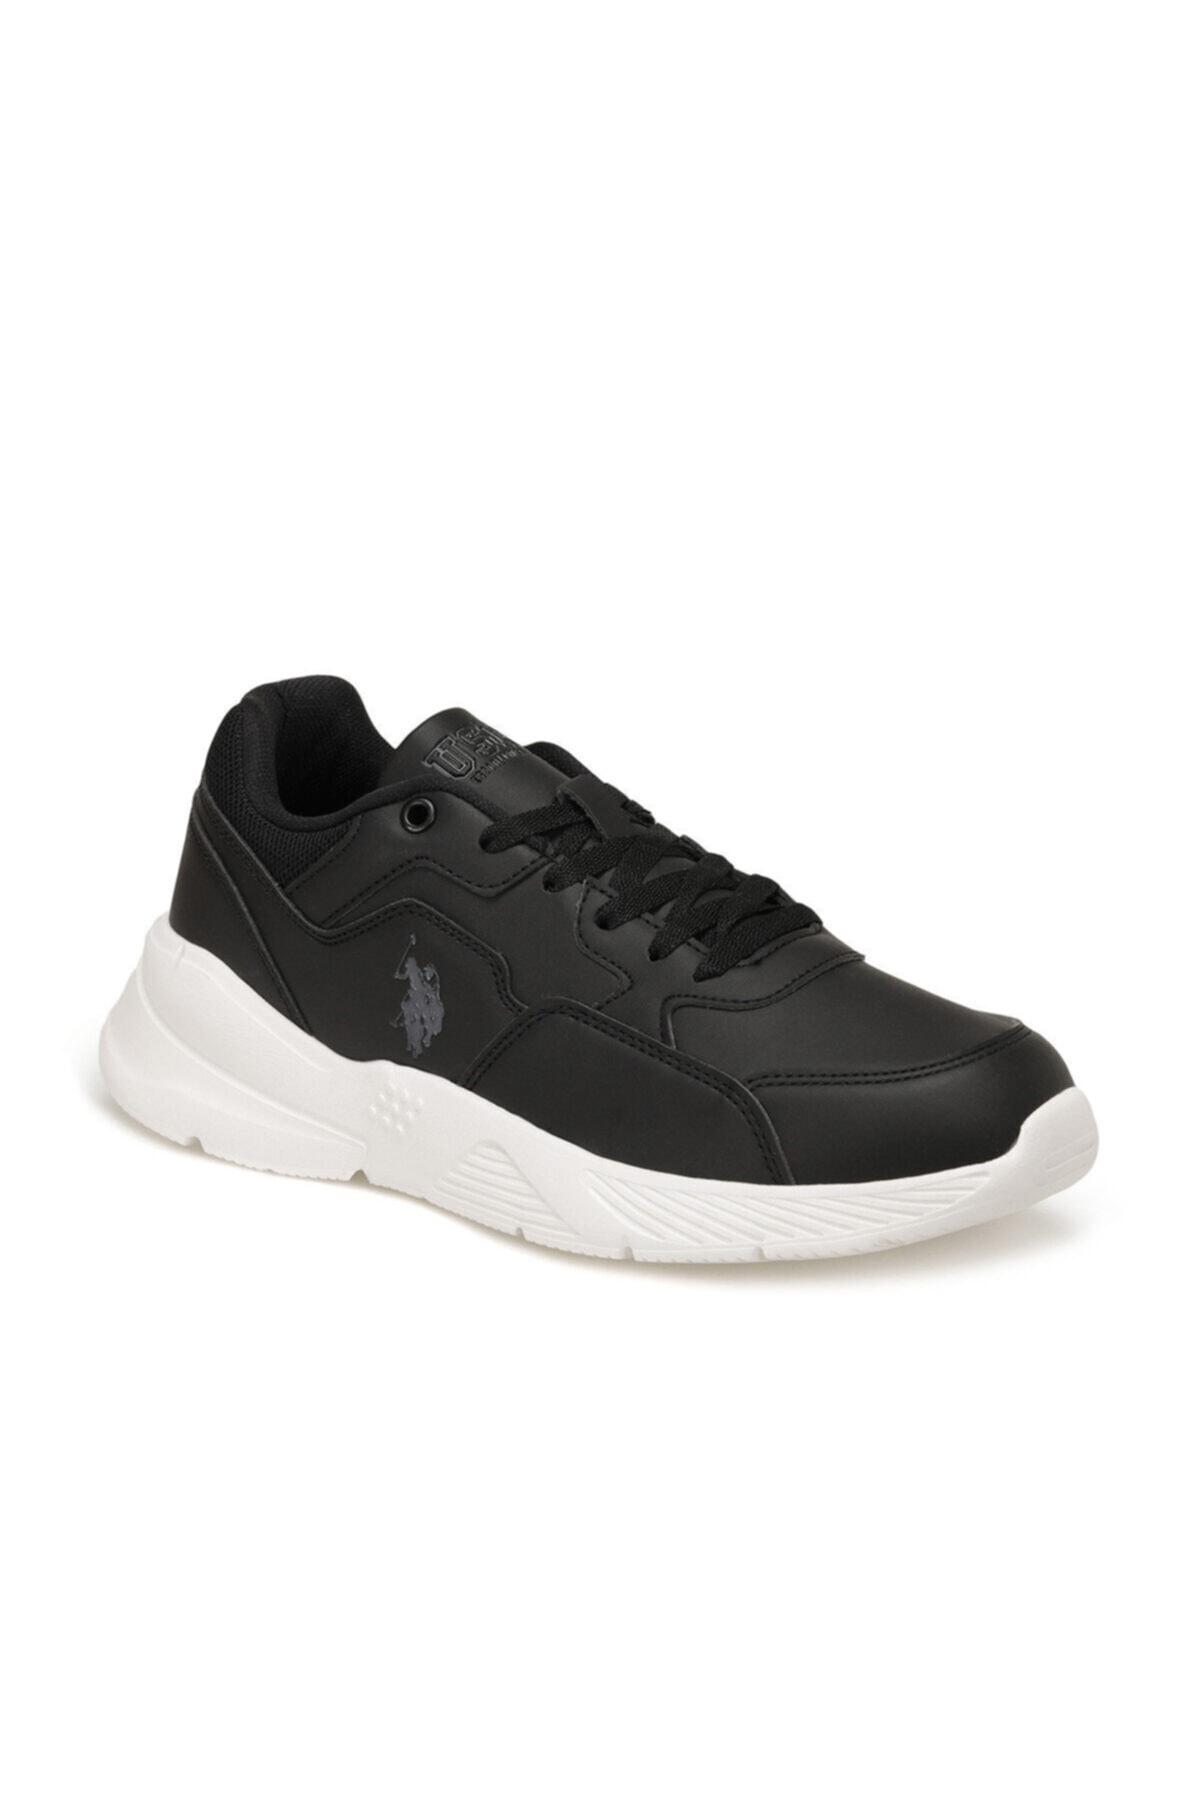 U.S. Polo Assn. FELIX Siyah Erkek Sneaker Ayakkabı 100536523 1